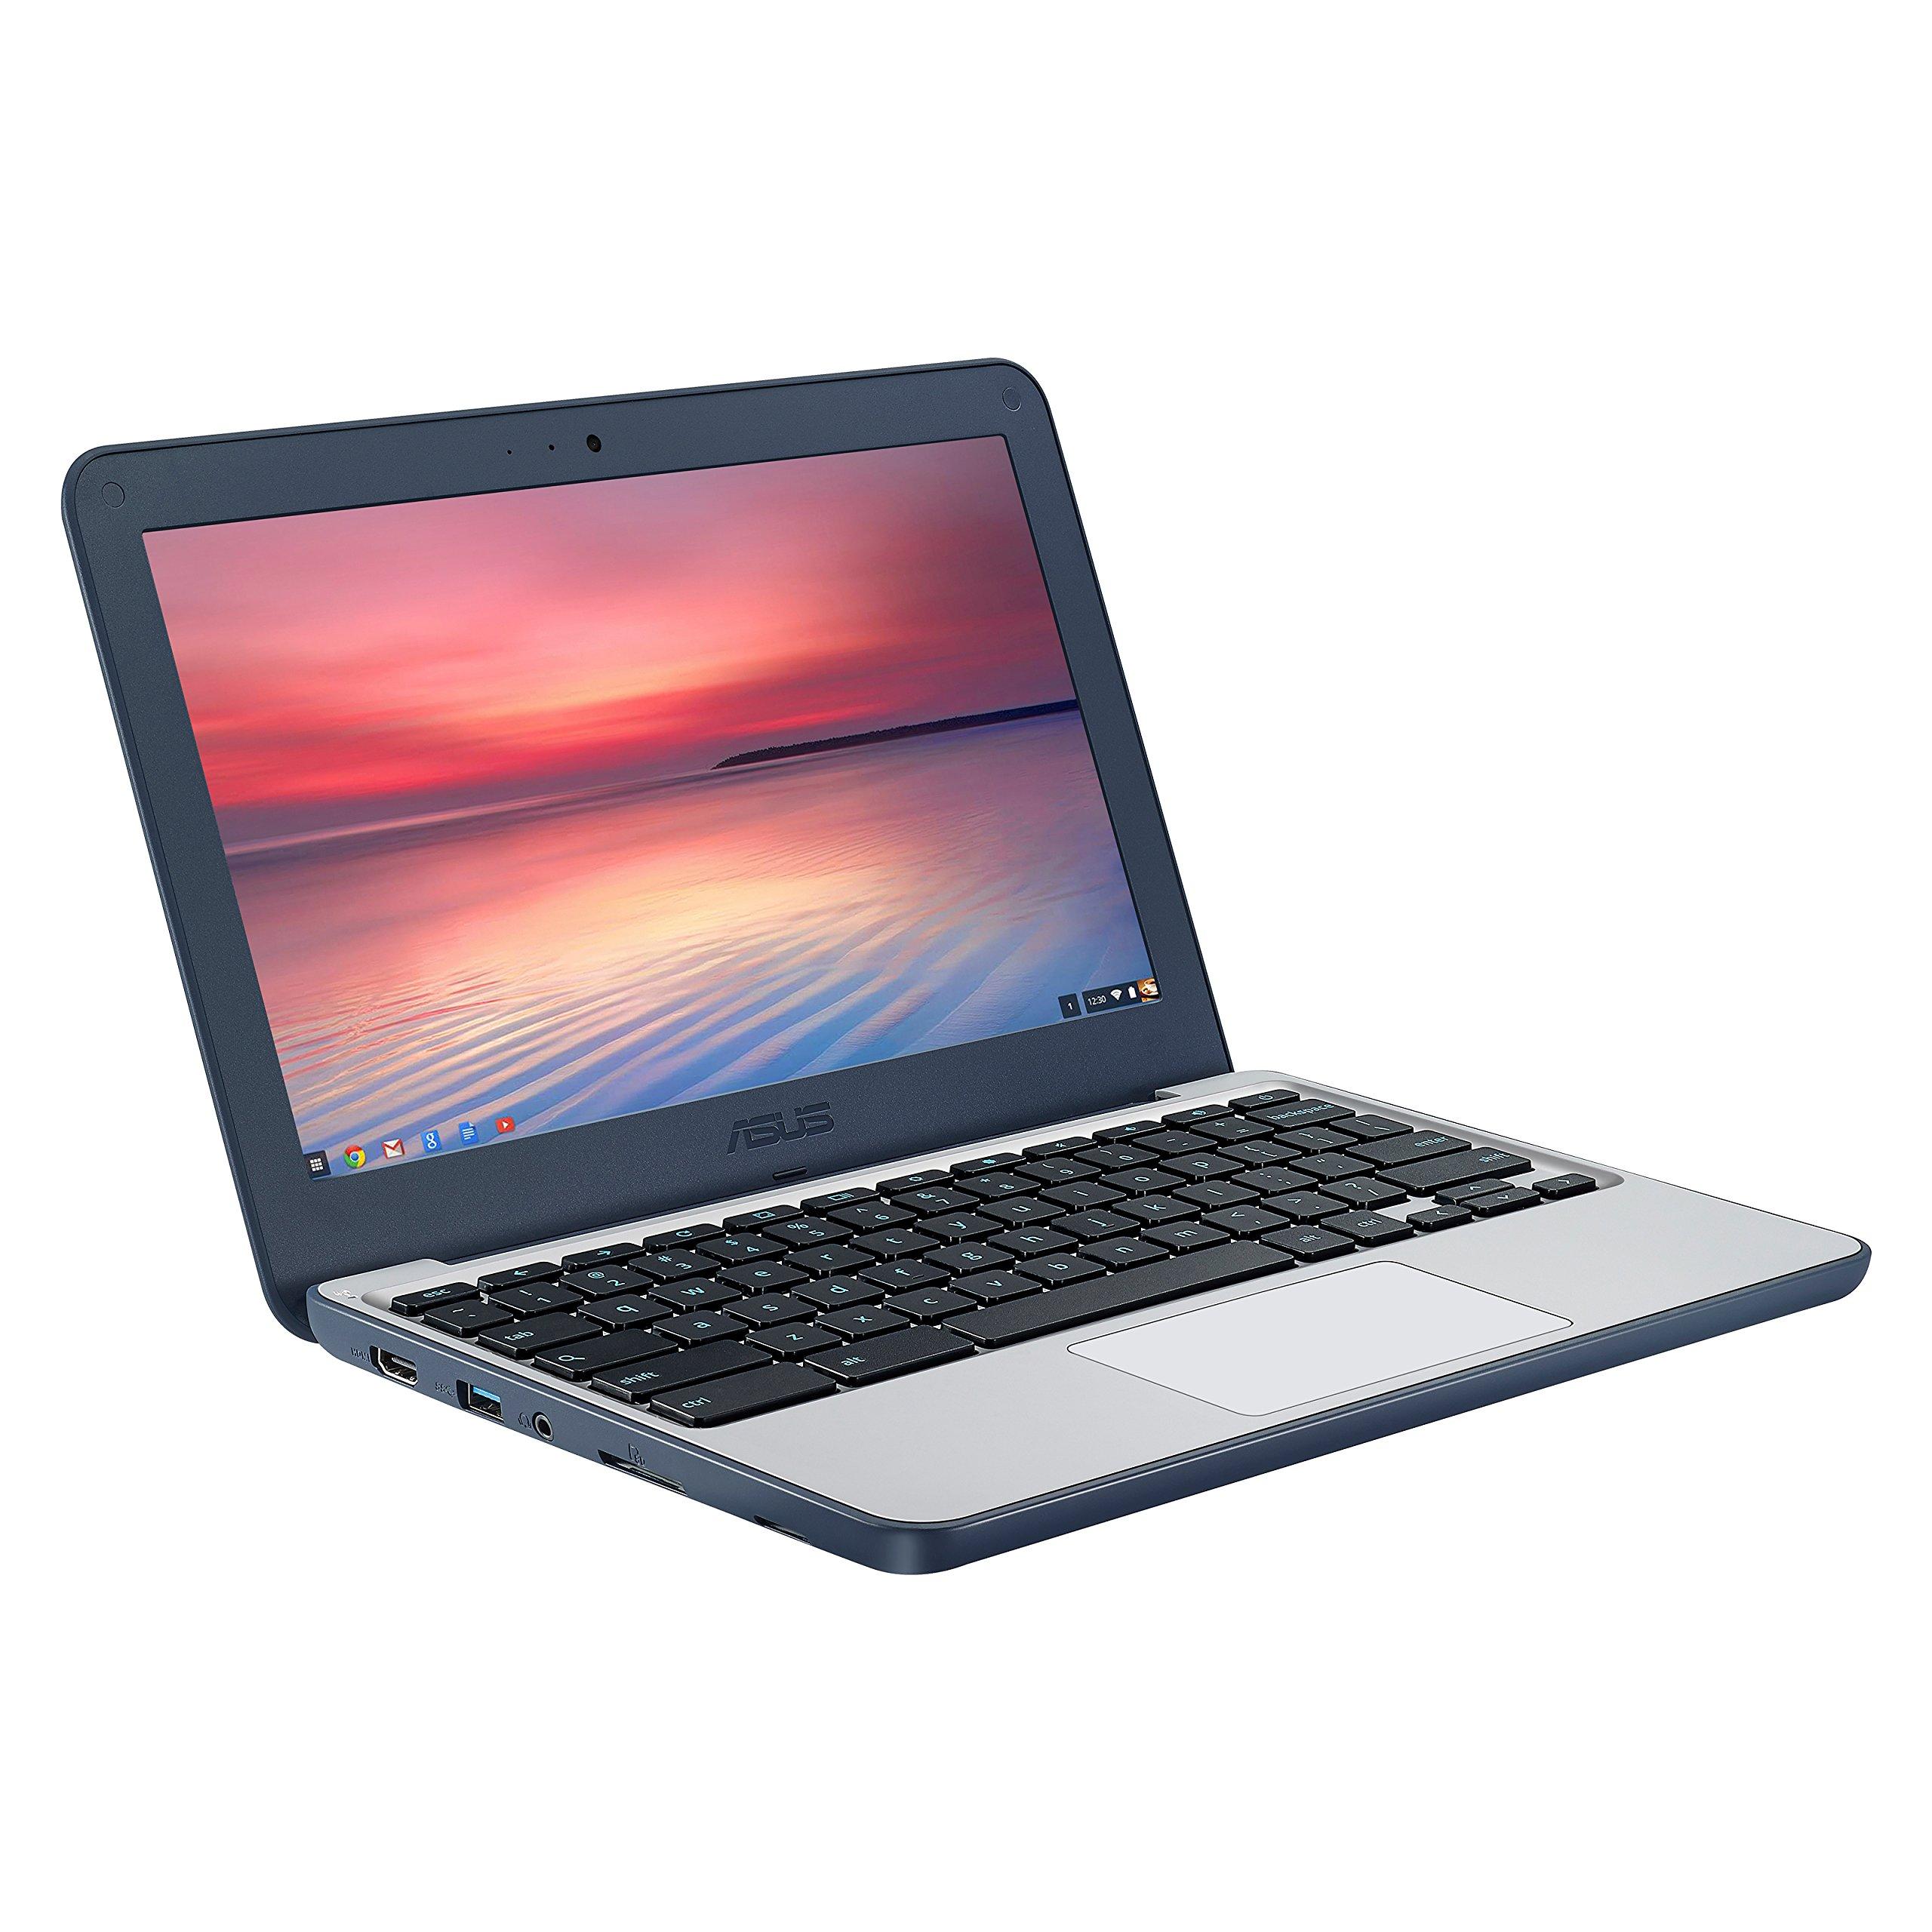 ASUS Chromebook C202SA YS04 Ruggedized Resistant